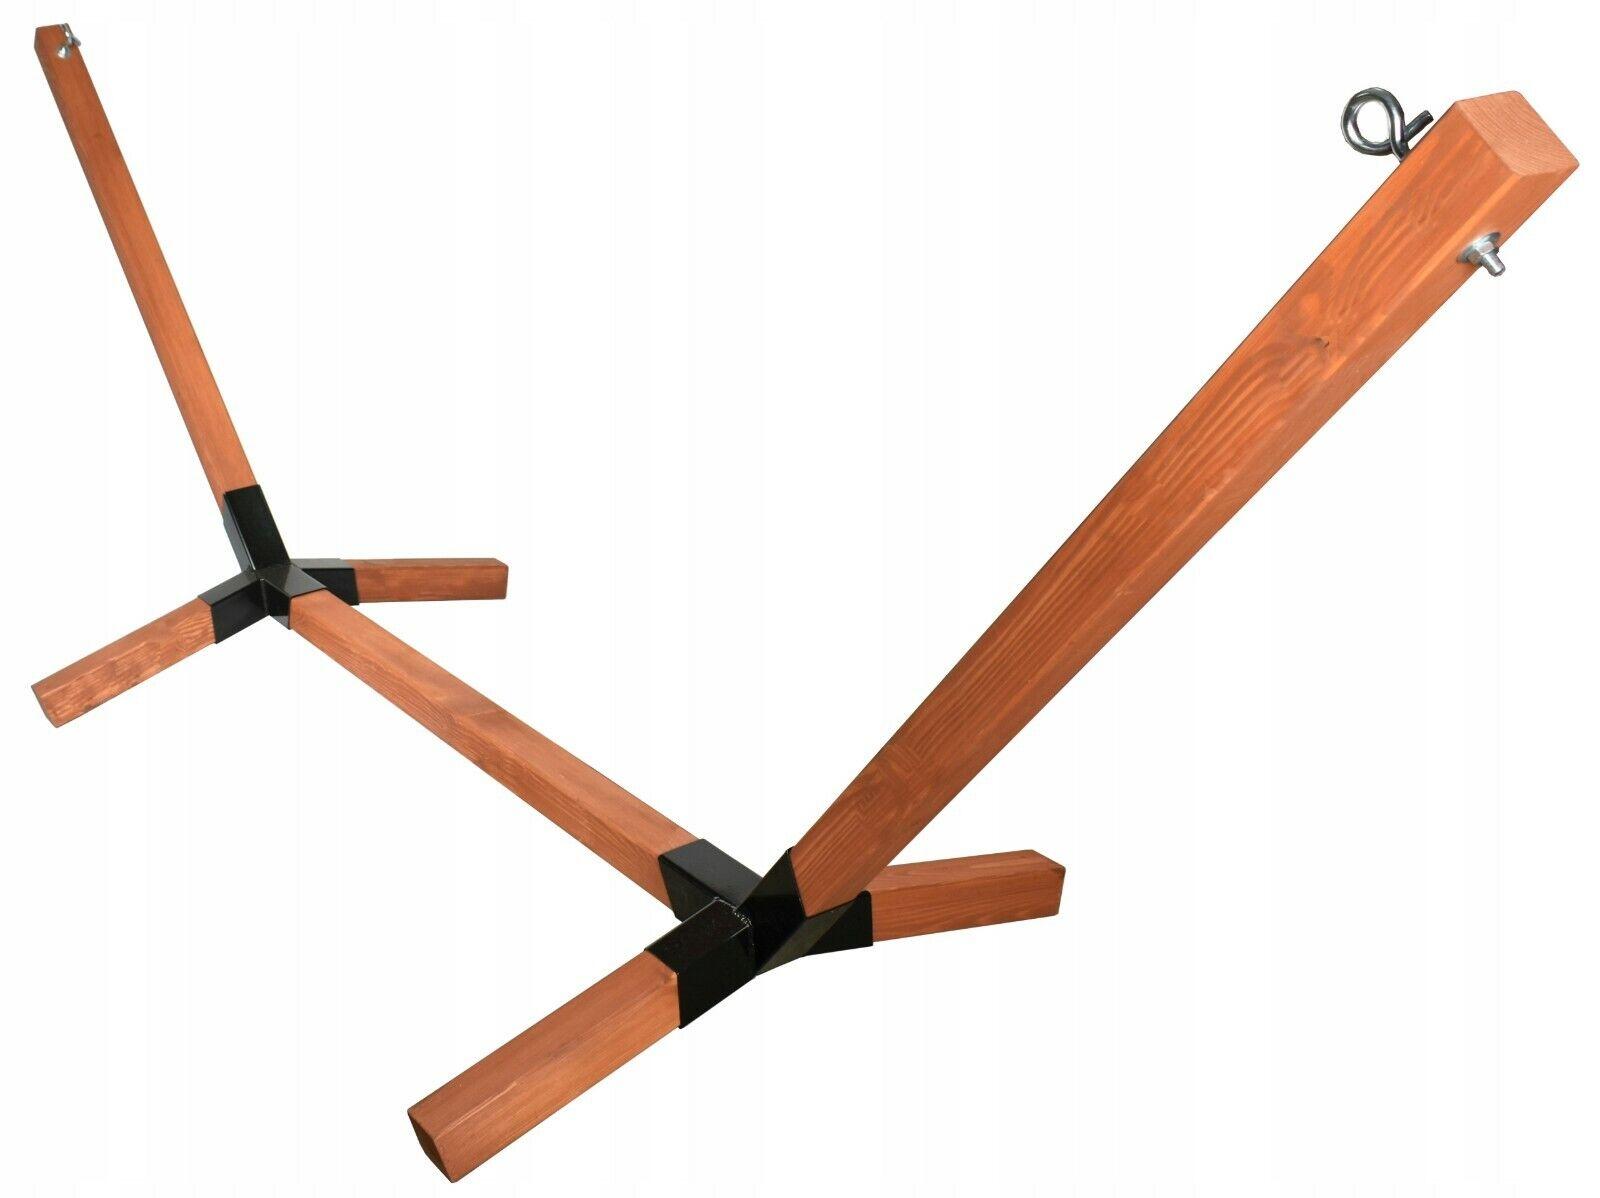 Hängemattegestell Gestell Holzgestell Hängeliege Stabil bis 300kg HOLZ Mahagoni